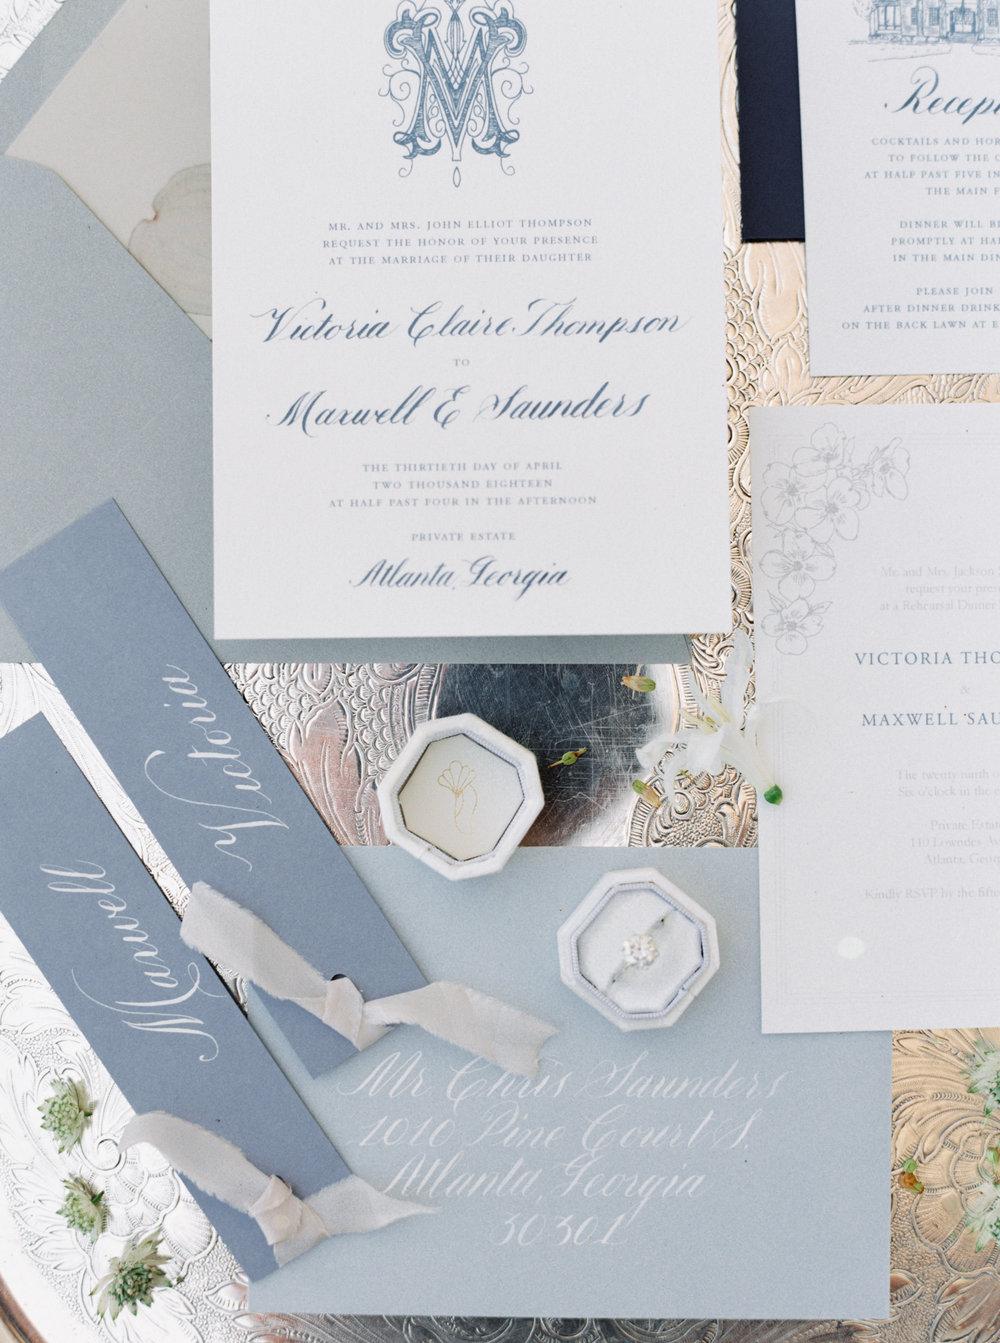 Pretty White and Light Blue Calligraphy Wedding Invitations